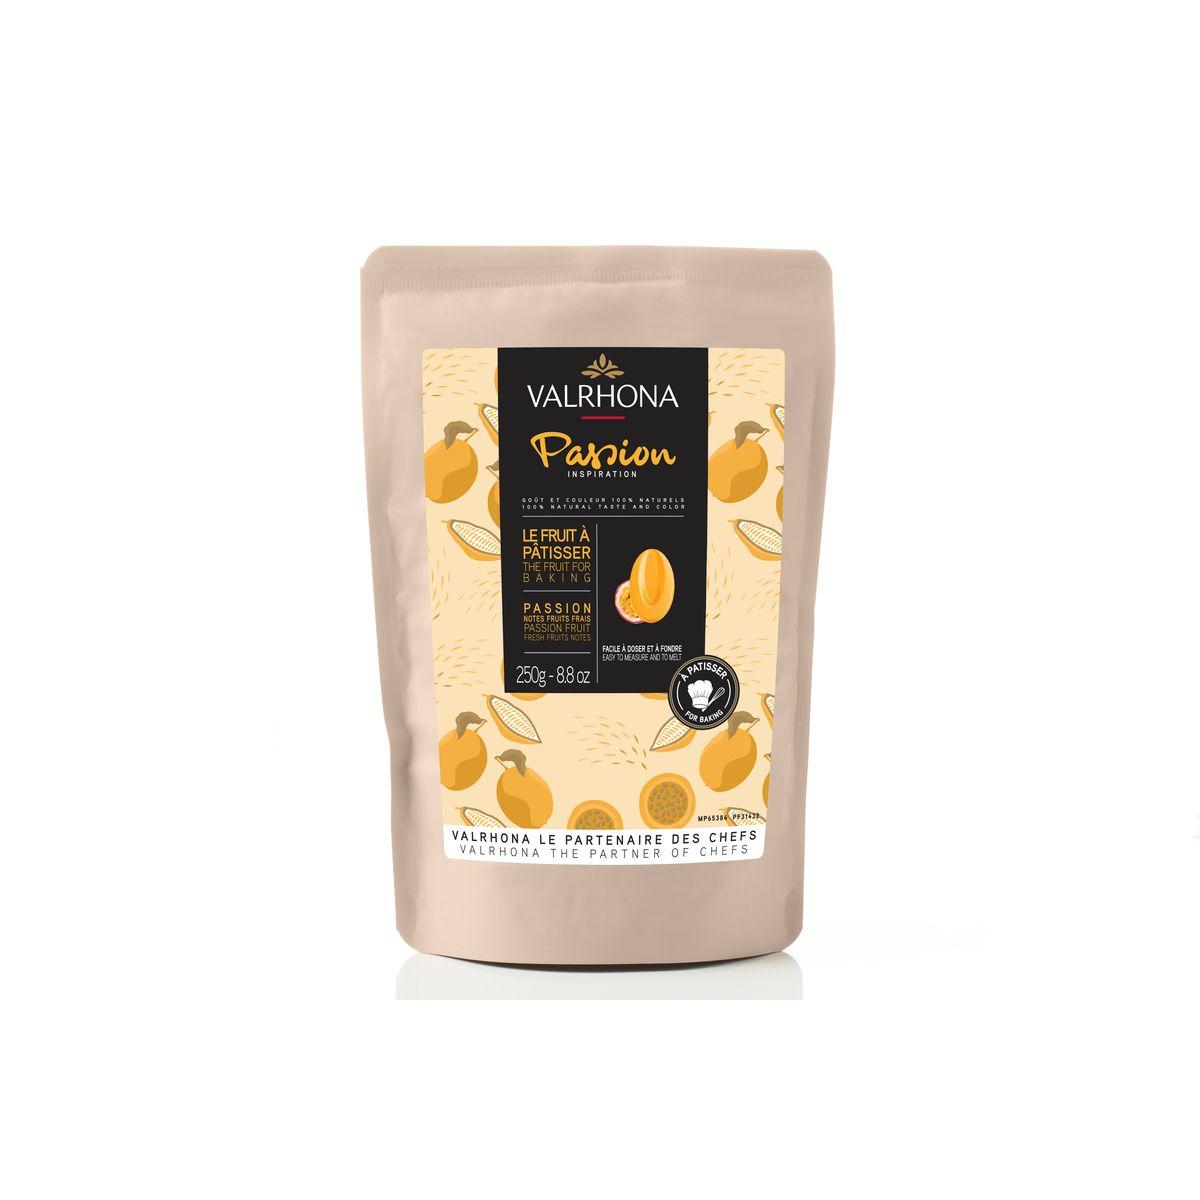 Chocolat à pâtisser inspiration passion 250g - Valrhona